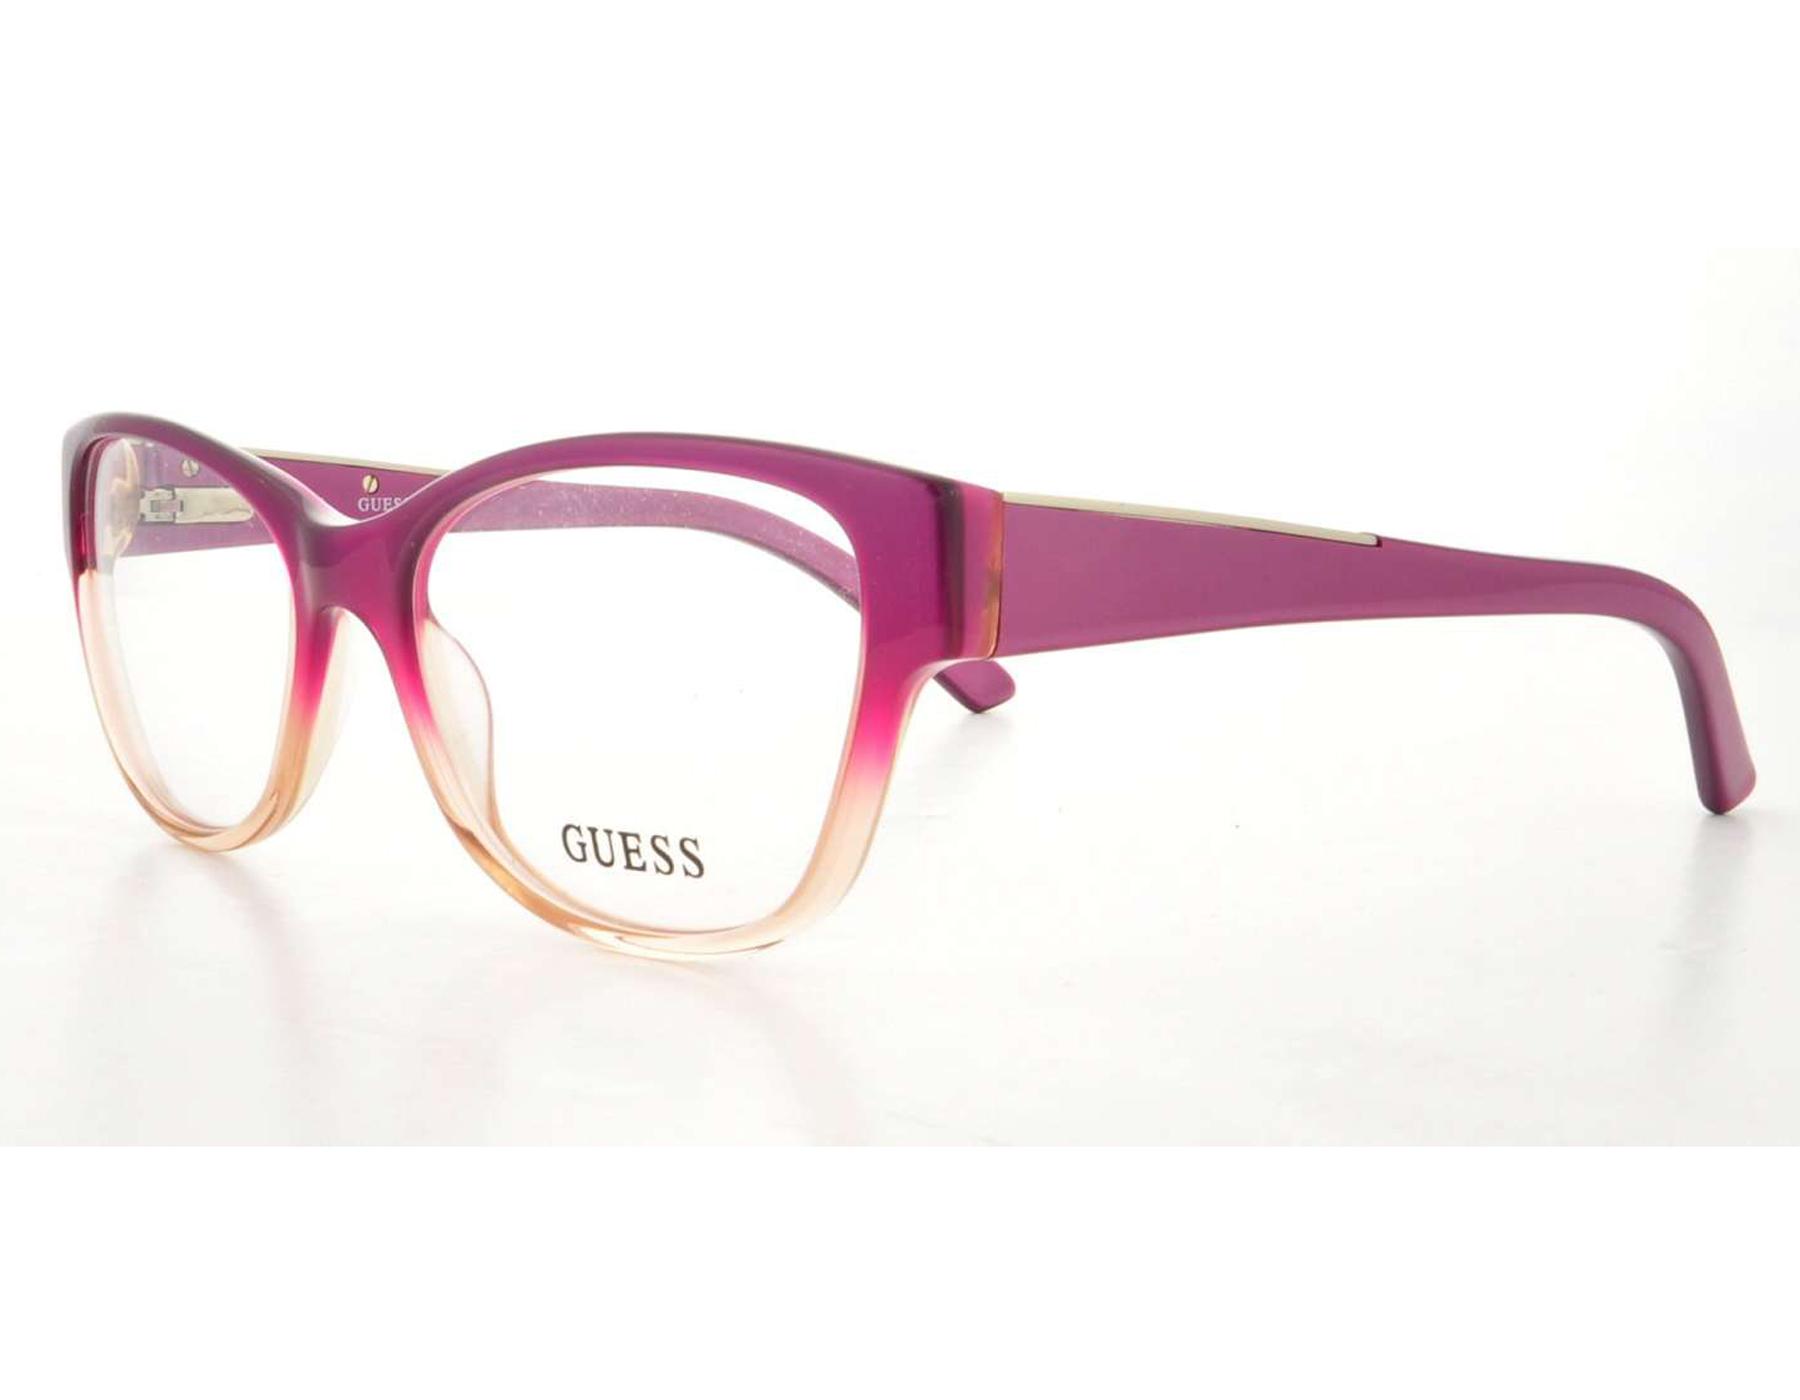 NEW Guess GU 2548 082 52mm Matte Turquoise Optical Eyeglasses Frames